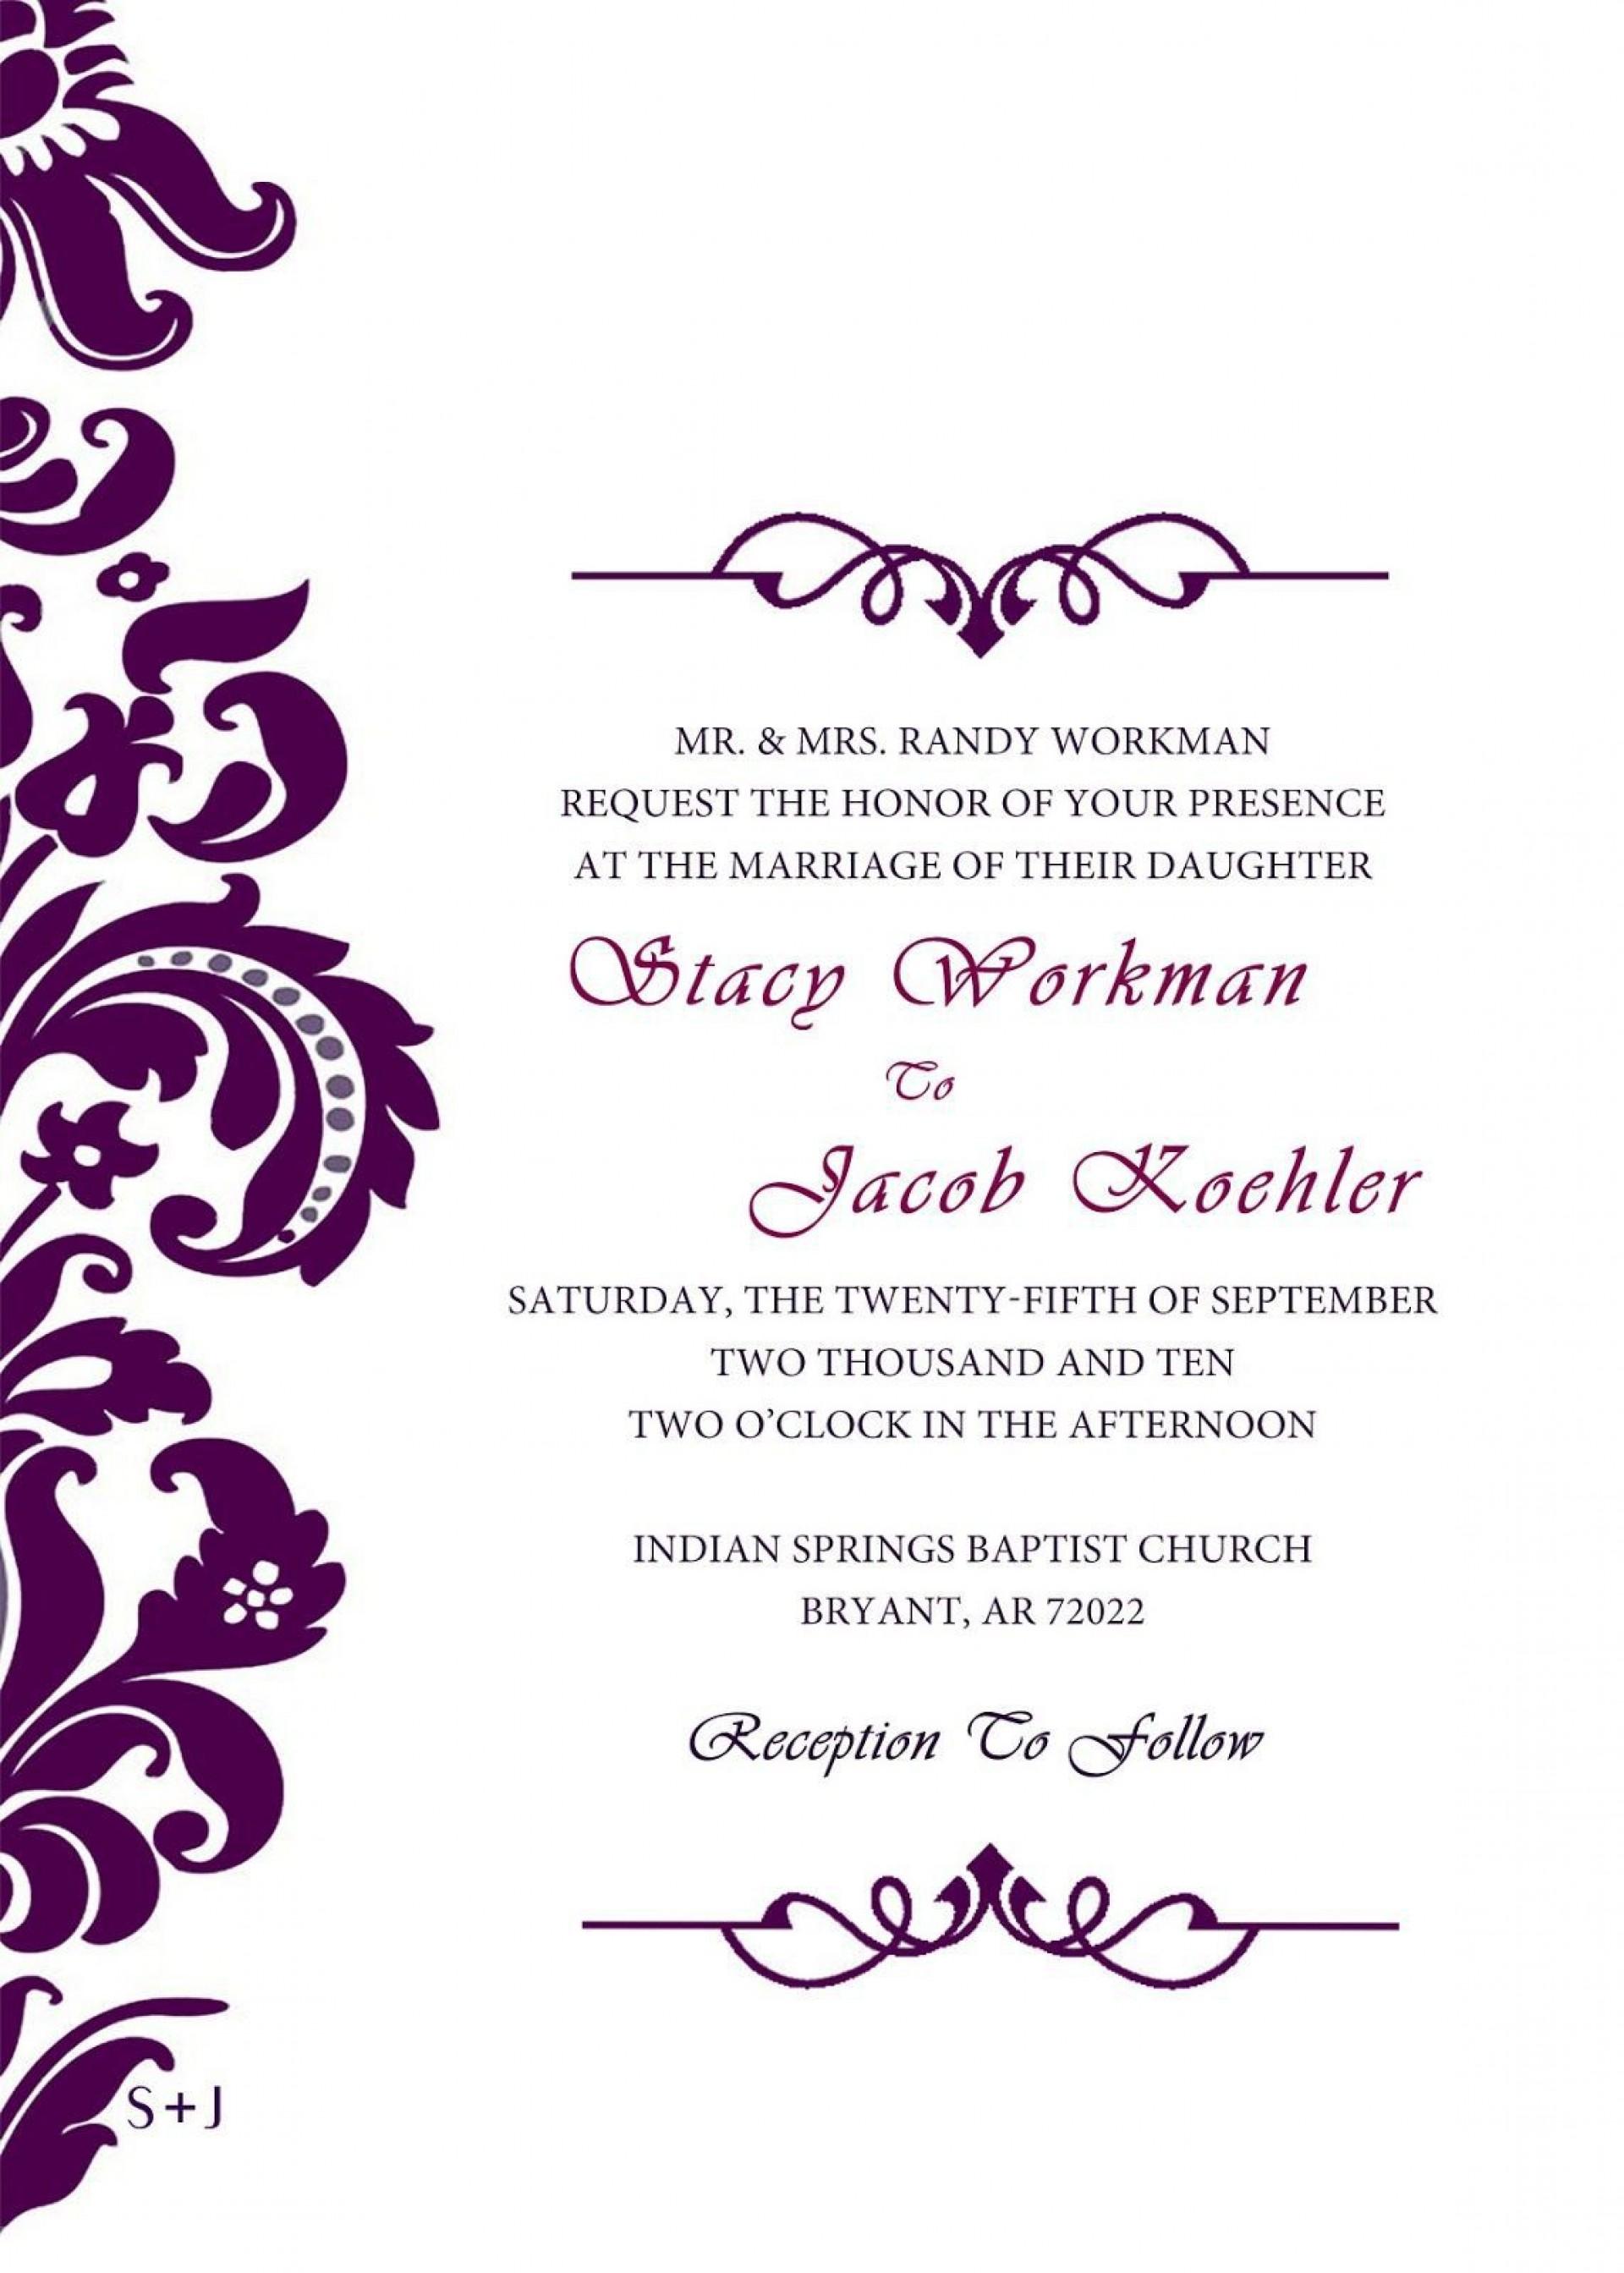 002 Dreaded Formal Wedding Invitation Template Free Highest Clarity 1920